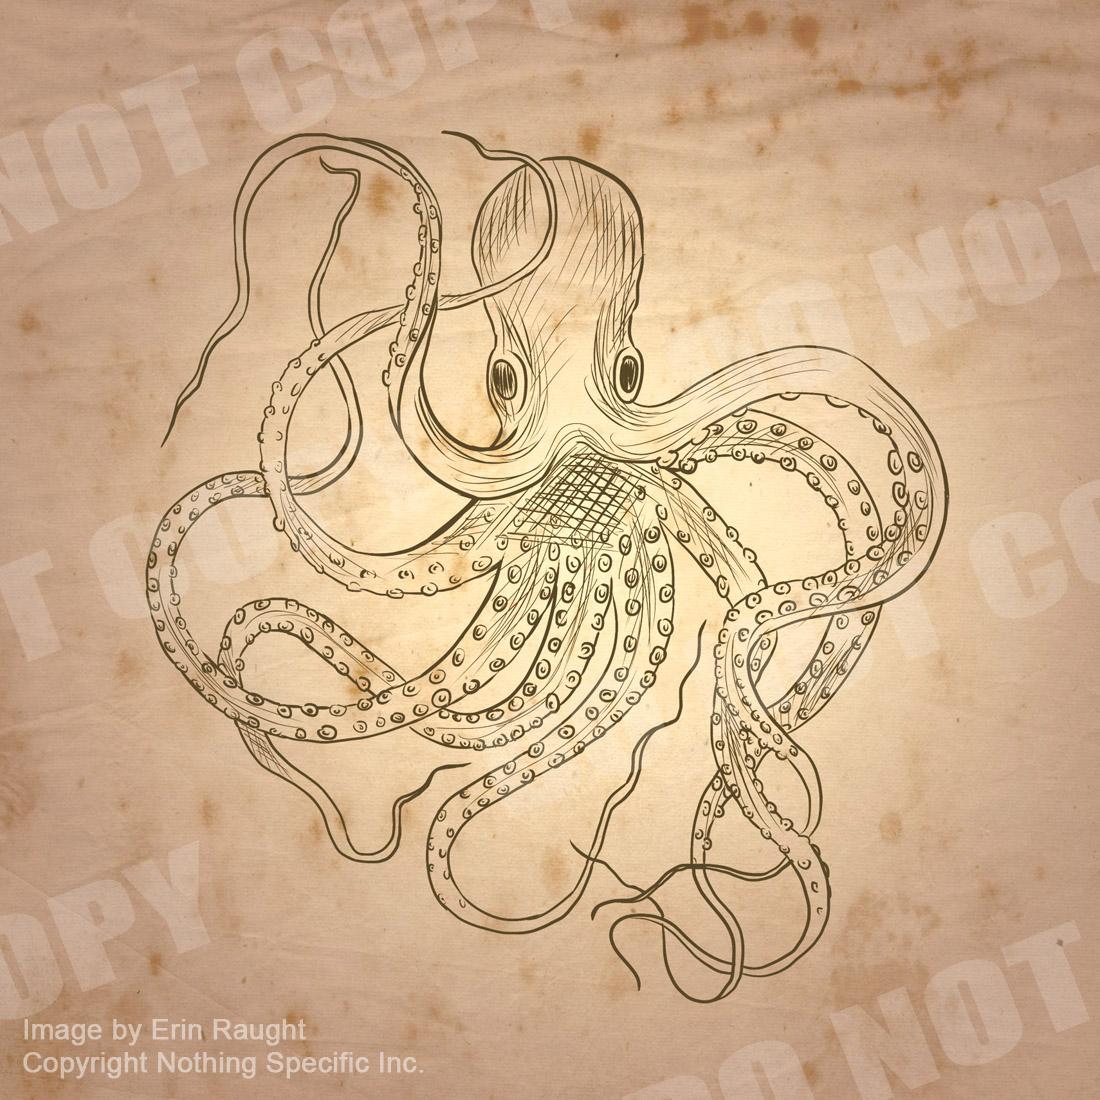 7415 - Vintage Ink Drawn Octopus - Sea Monster Tattoo.jpg